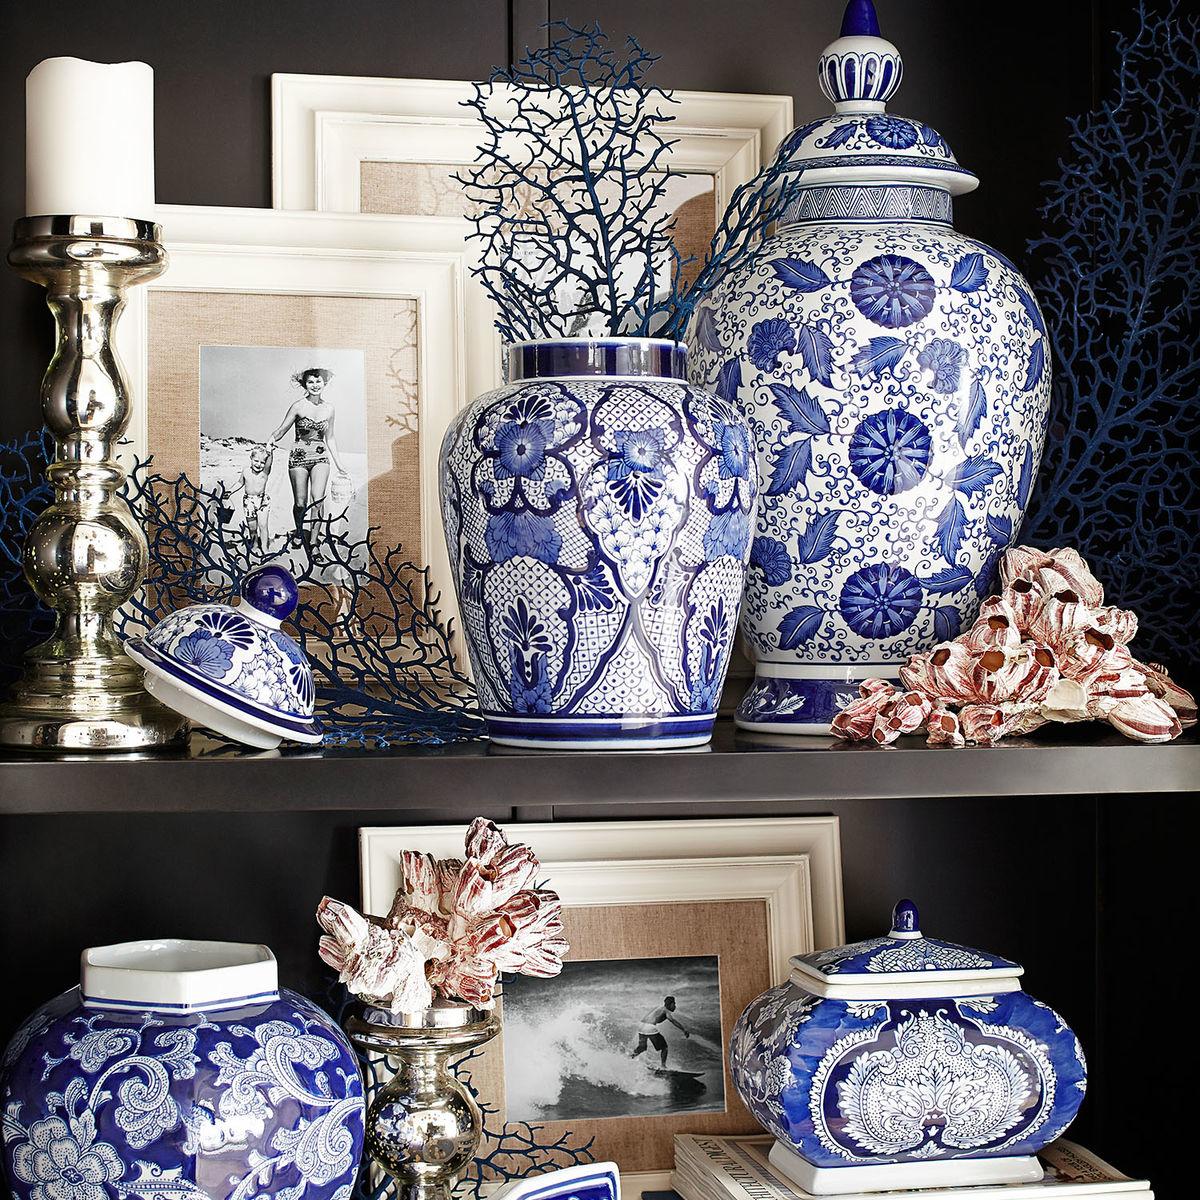 vignette design: Inspired By Blue And White Porcelain